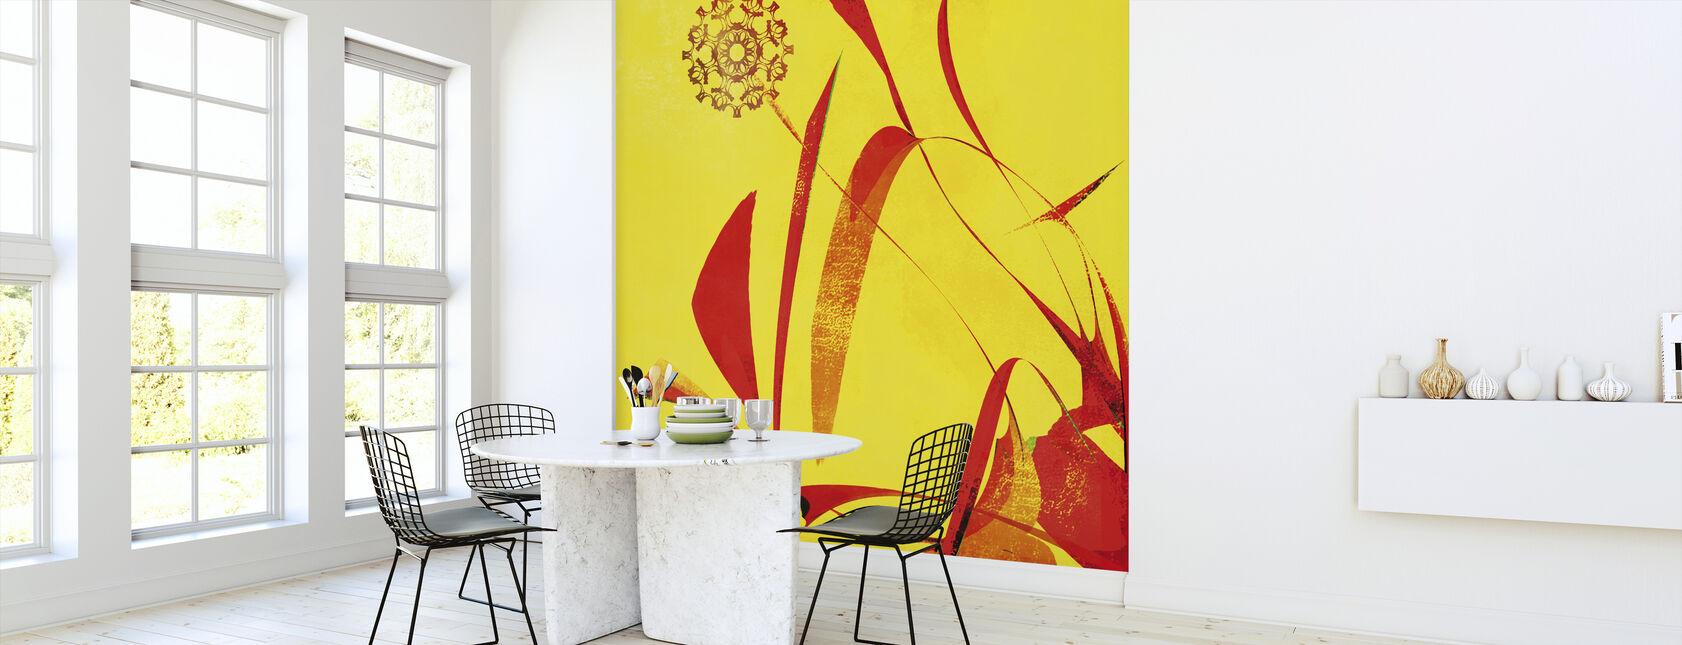 Abstract Dandelion - Wallpaper - Kitchen